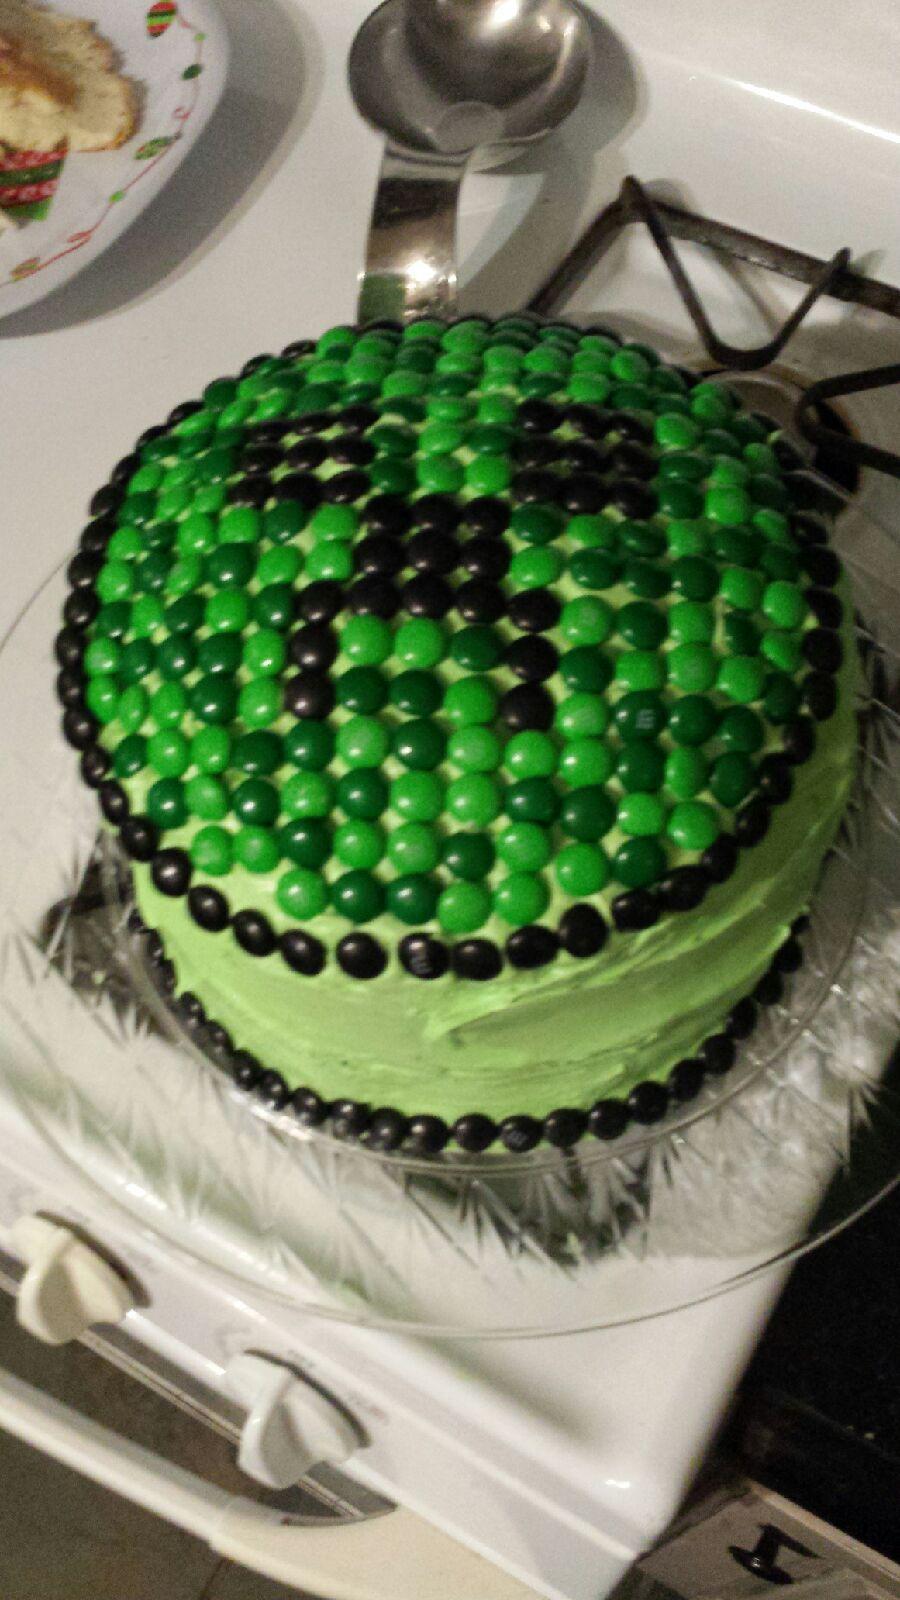 Homemade Minecraft Cake Nom Nom Pinterest Homemade Minecraft